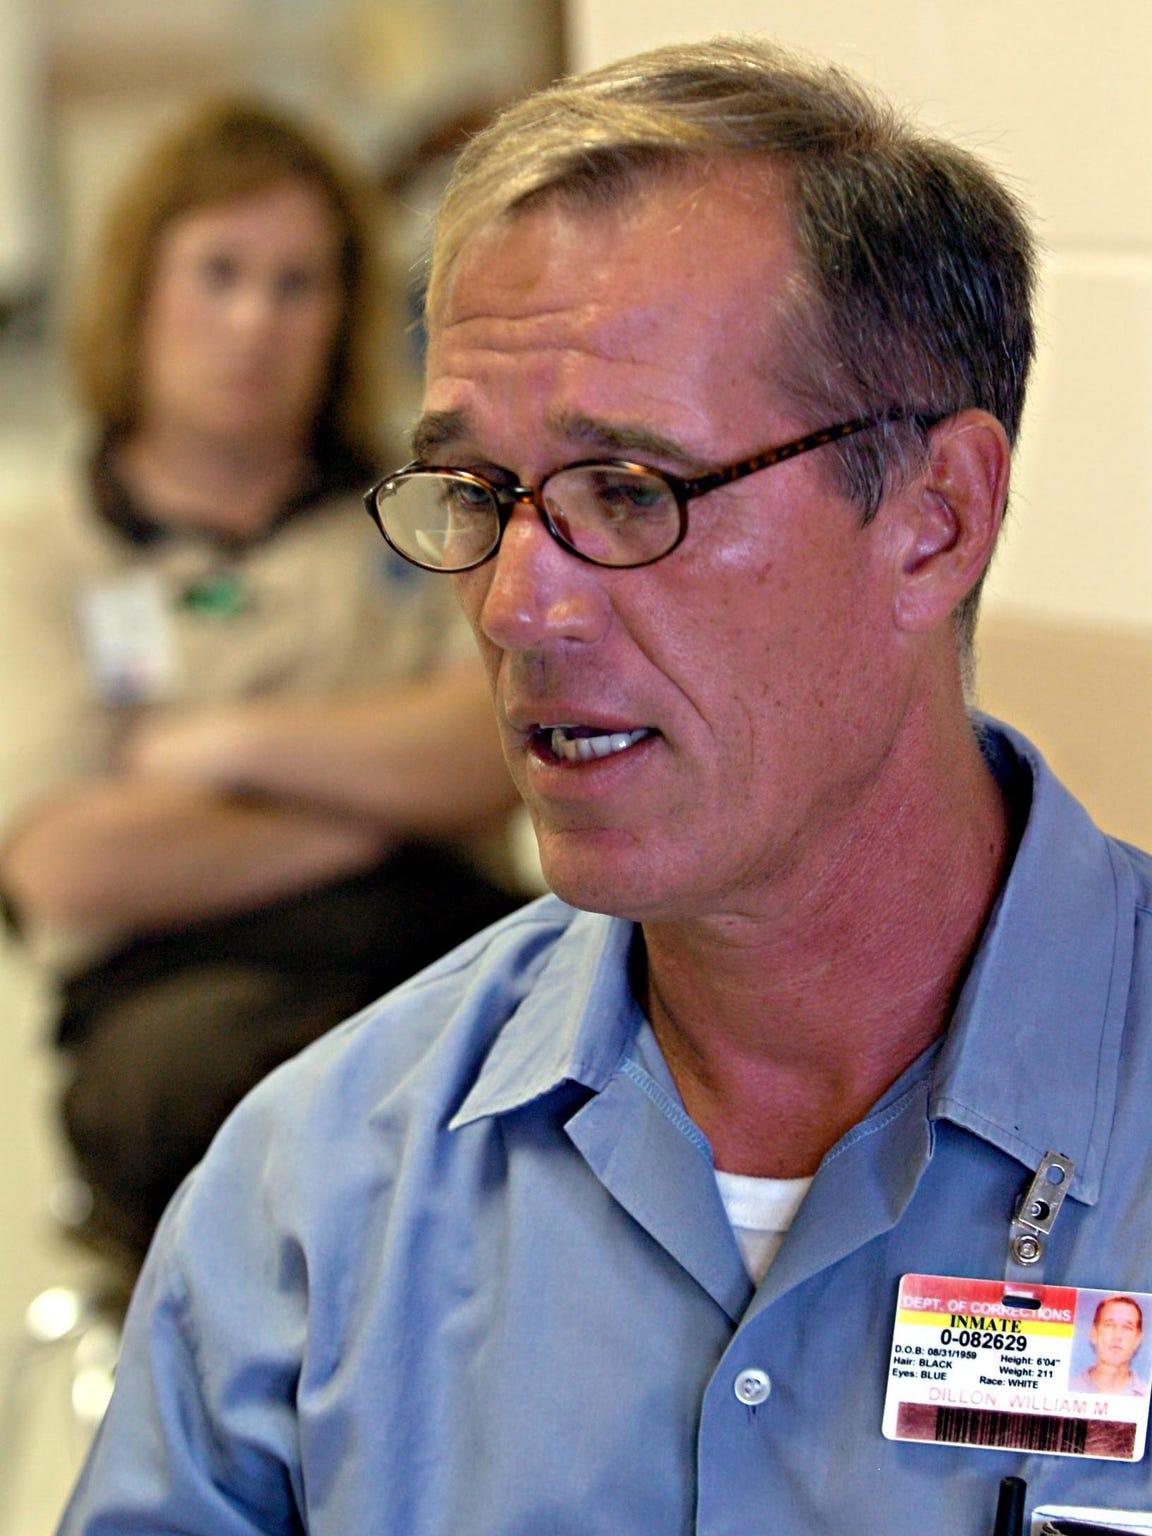 Craig Rubadoux,,,8-8-08,,,William Dillon, 49, , has